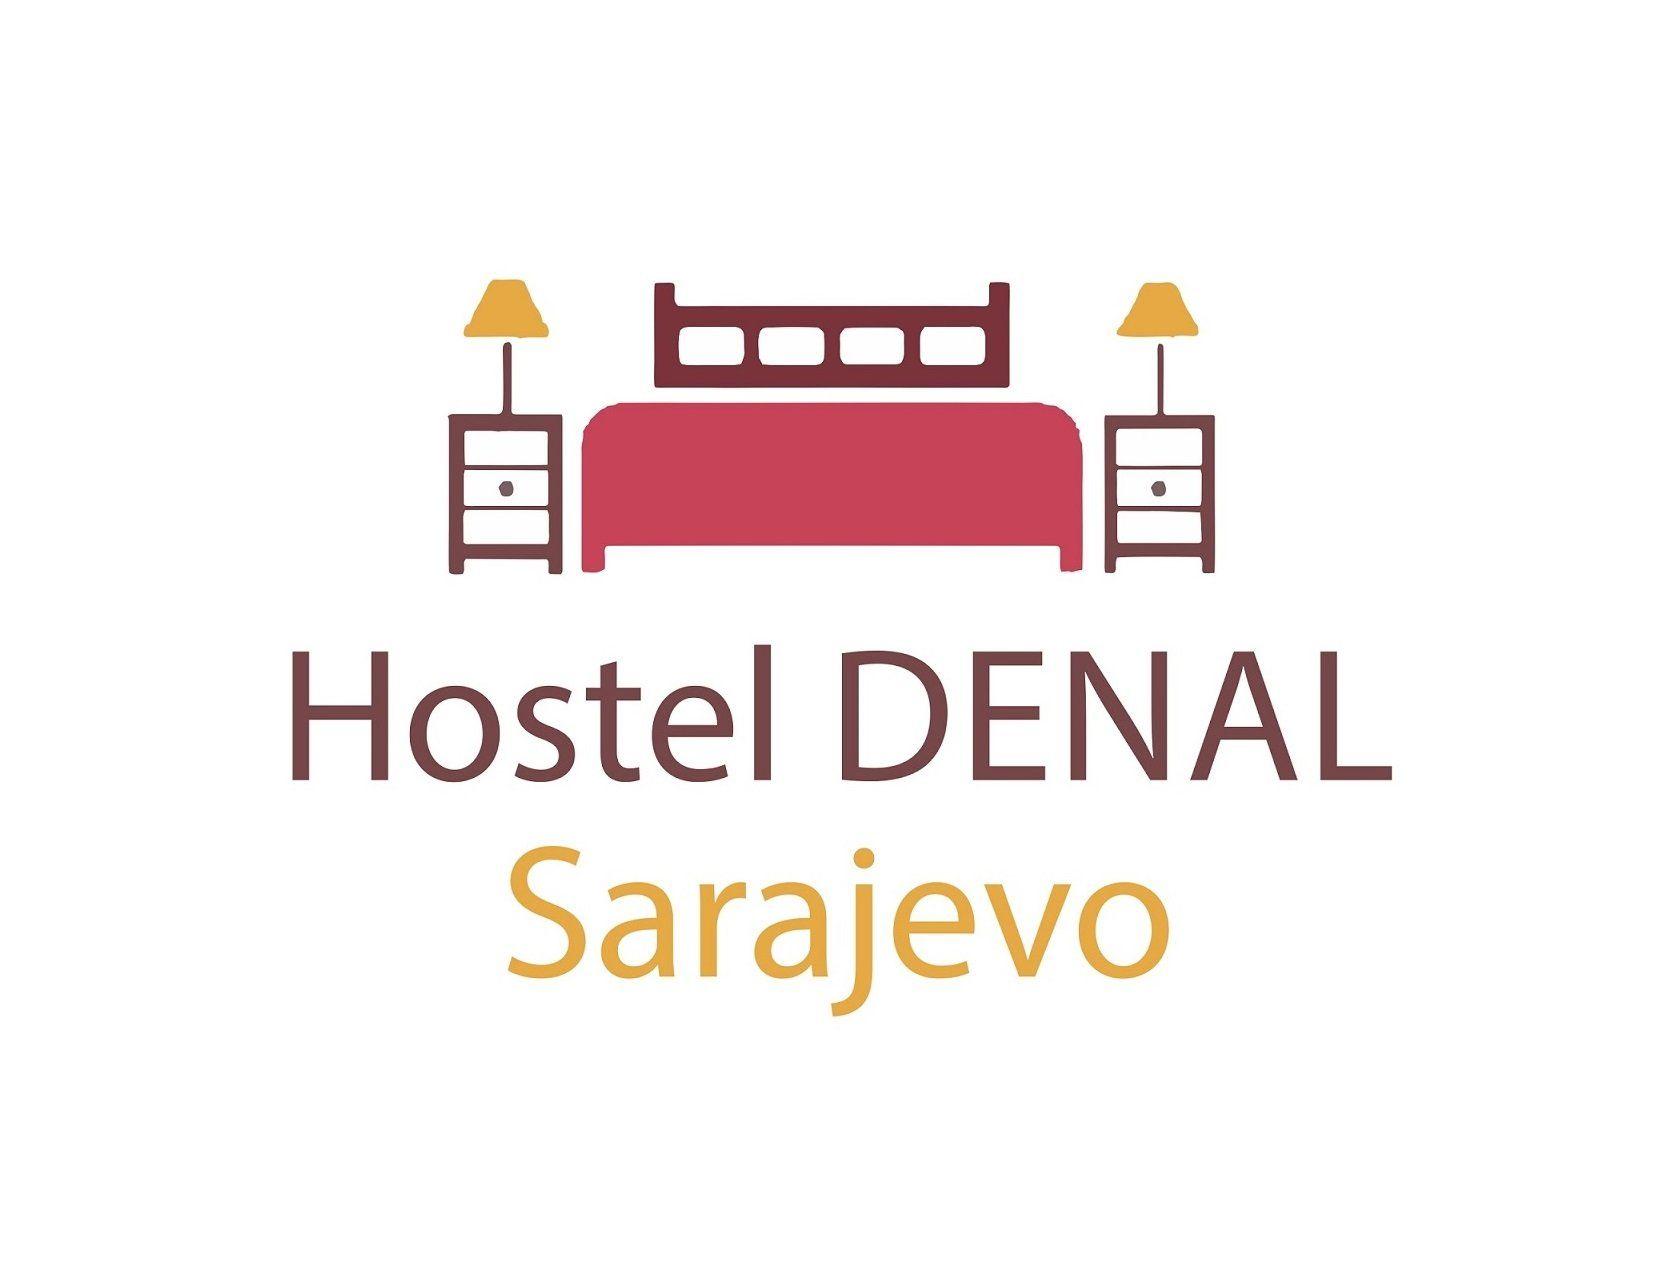 Hostel Denal